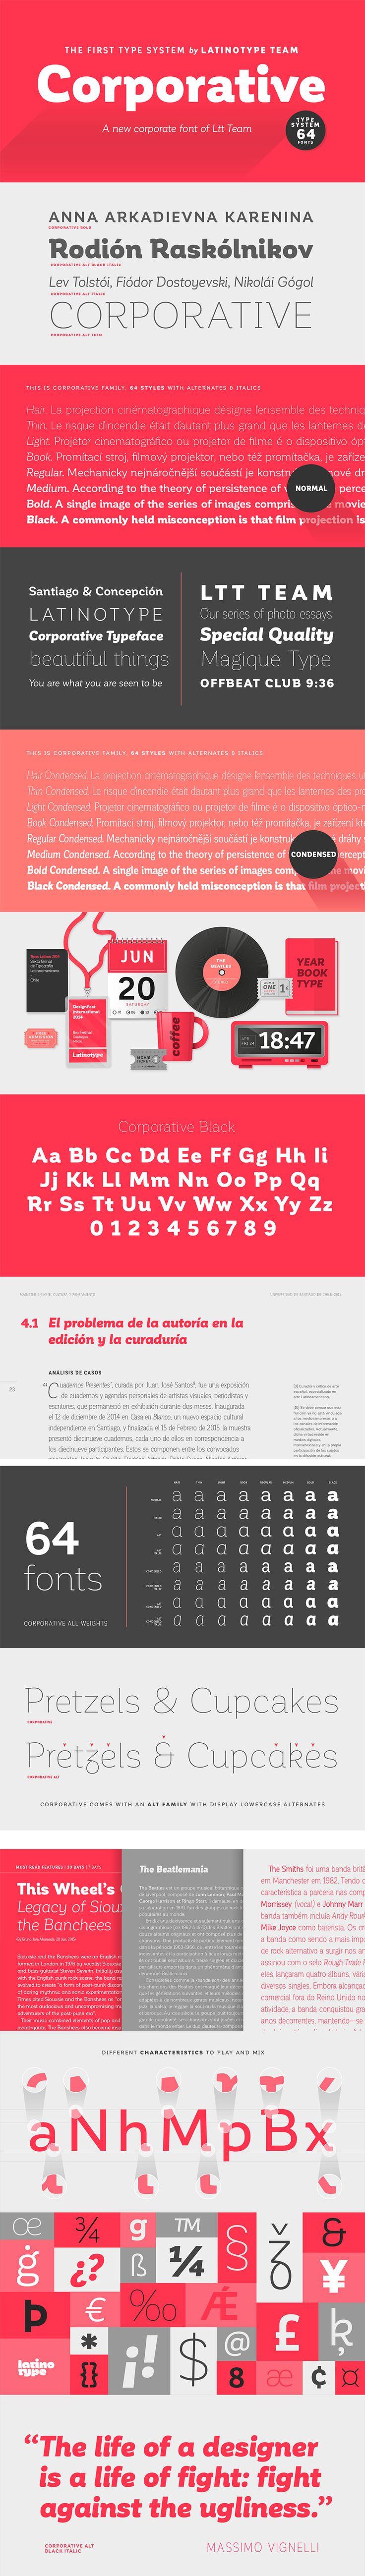 22 World Class Quality Fonts